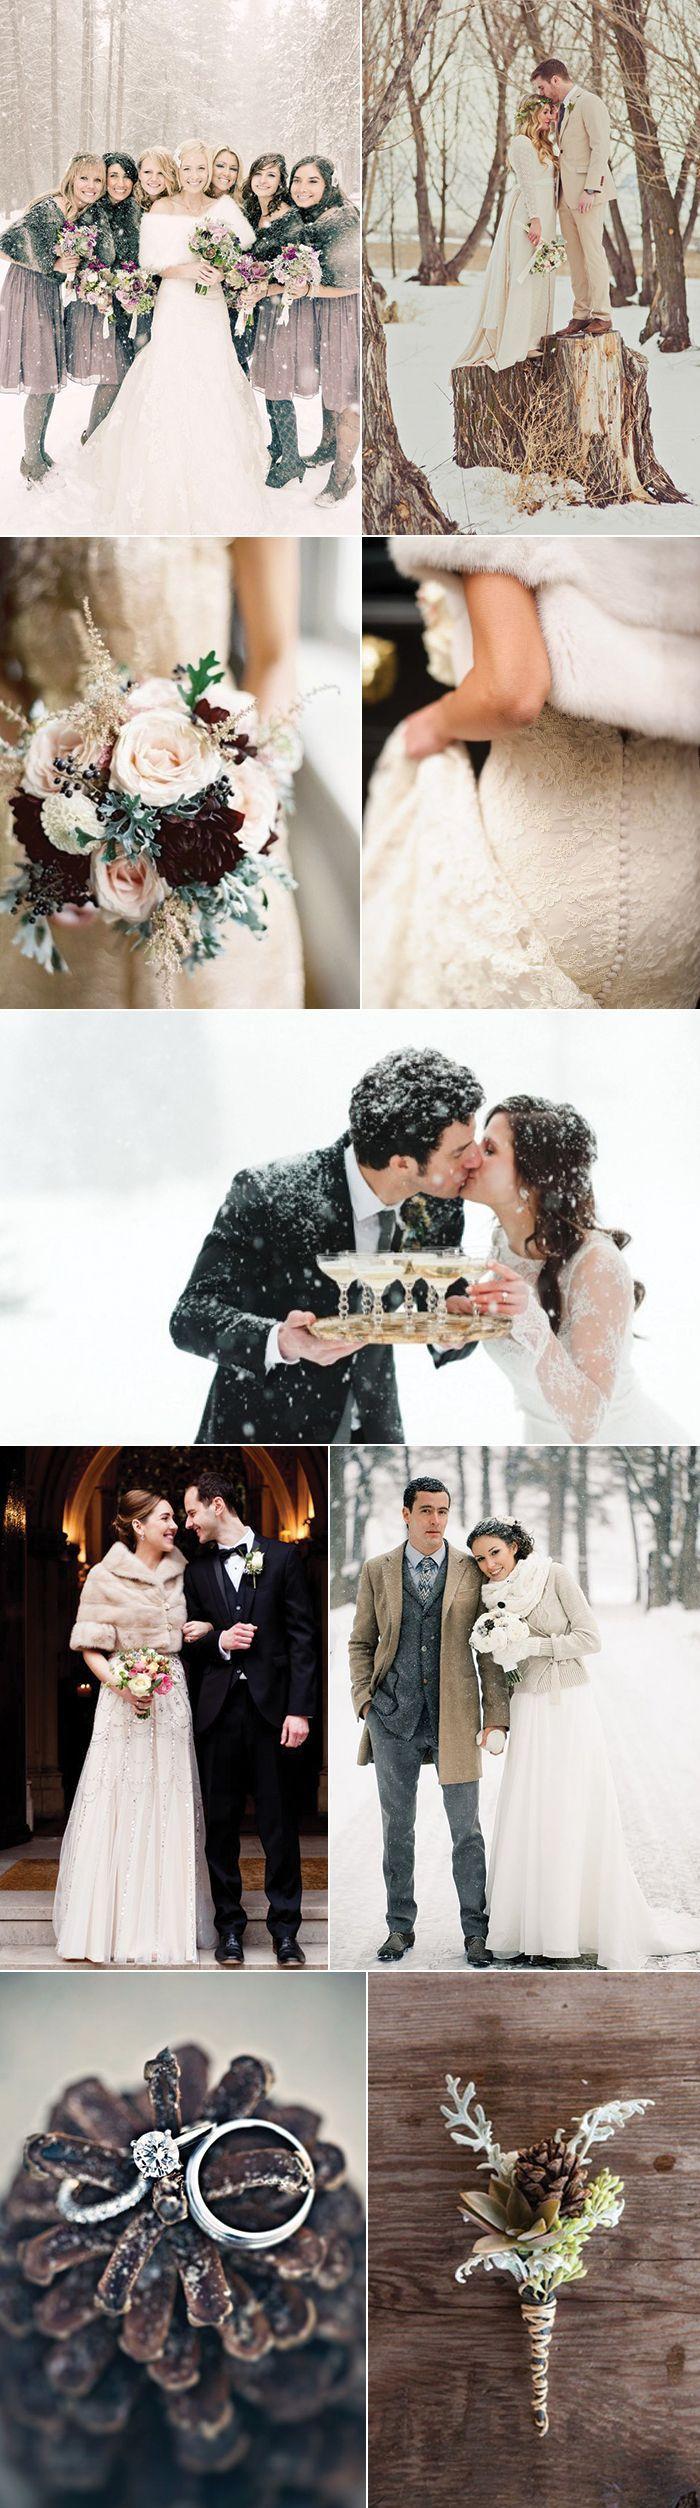 Winter Wedding Inspiration. So beautiful!!!